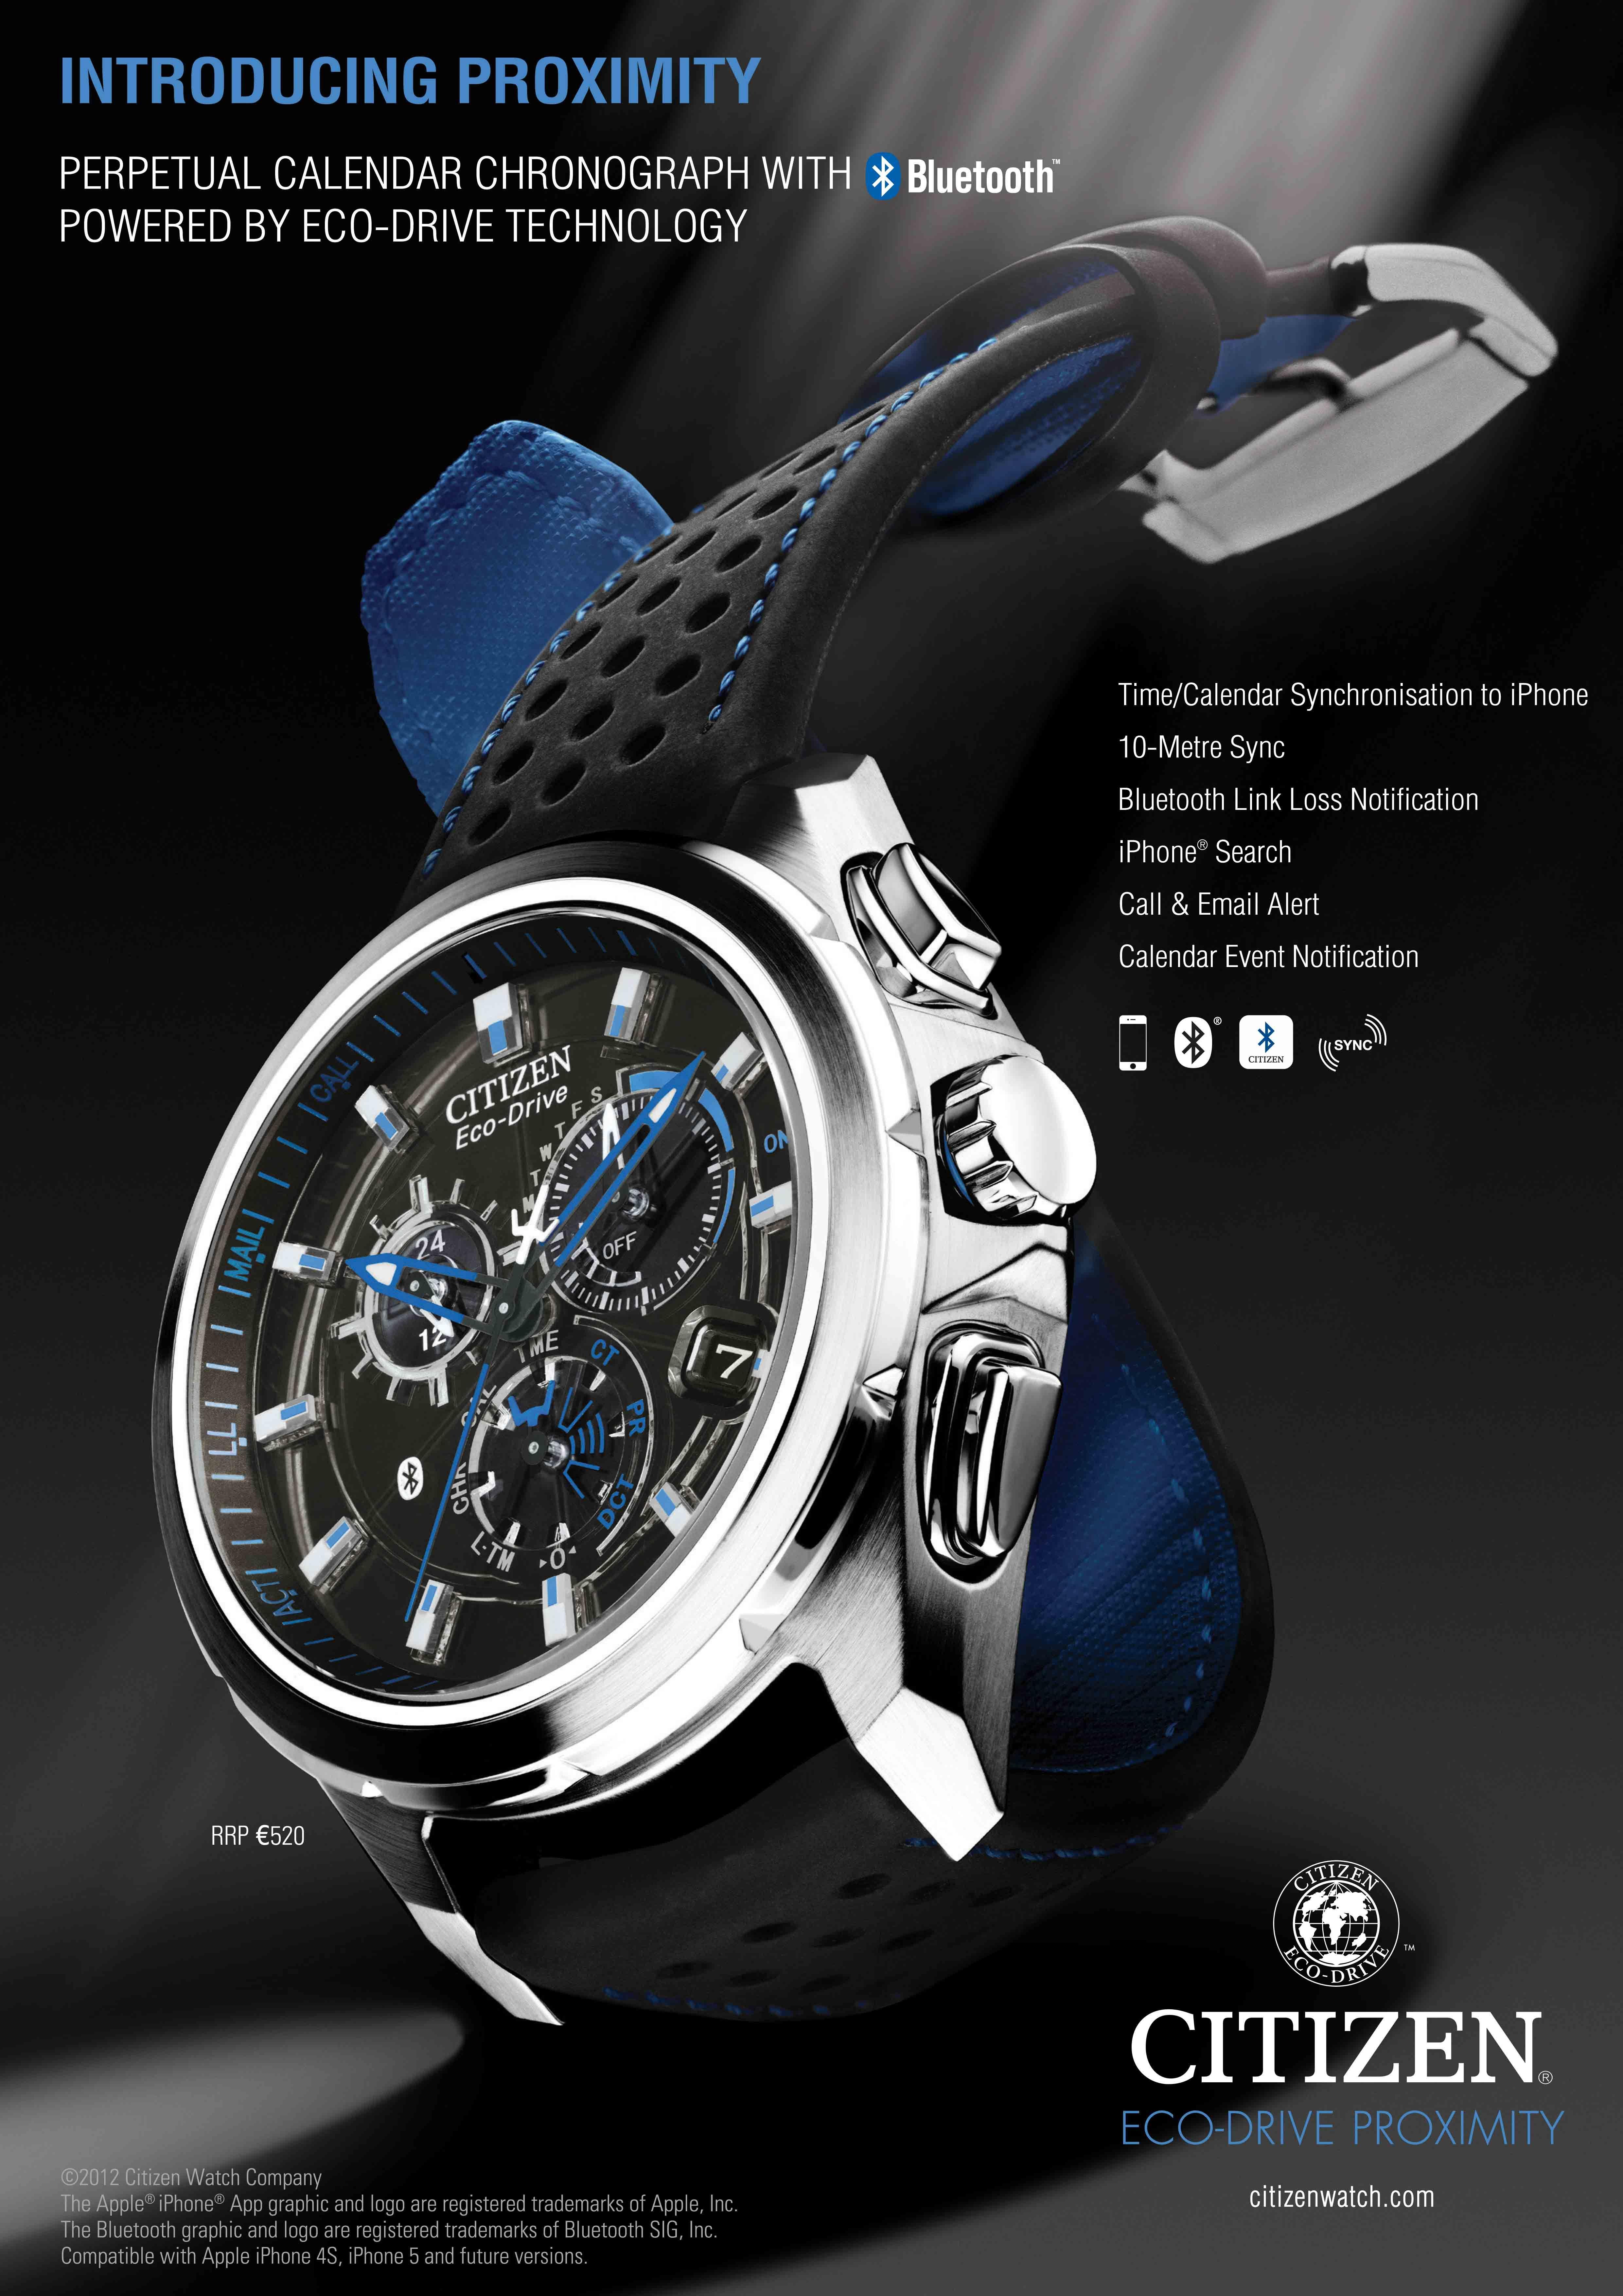 The Citizen Eco-Drive Proximity Watch has an accompanying ...